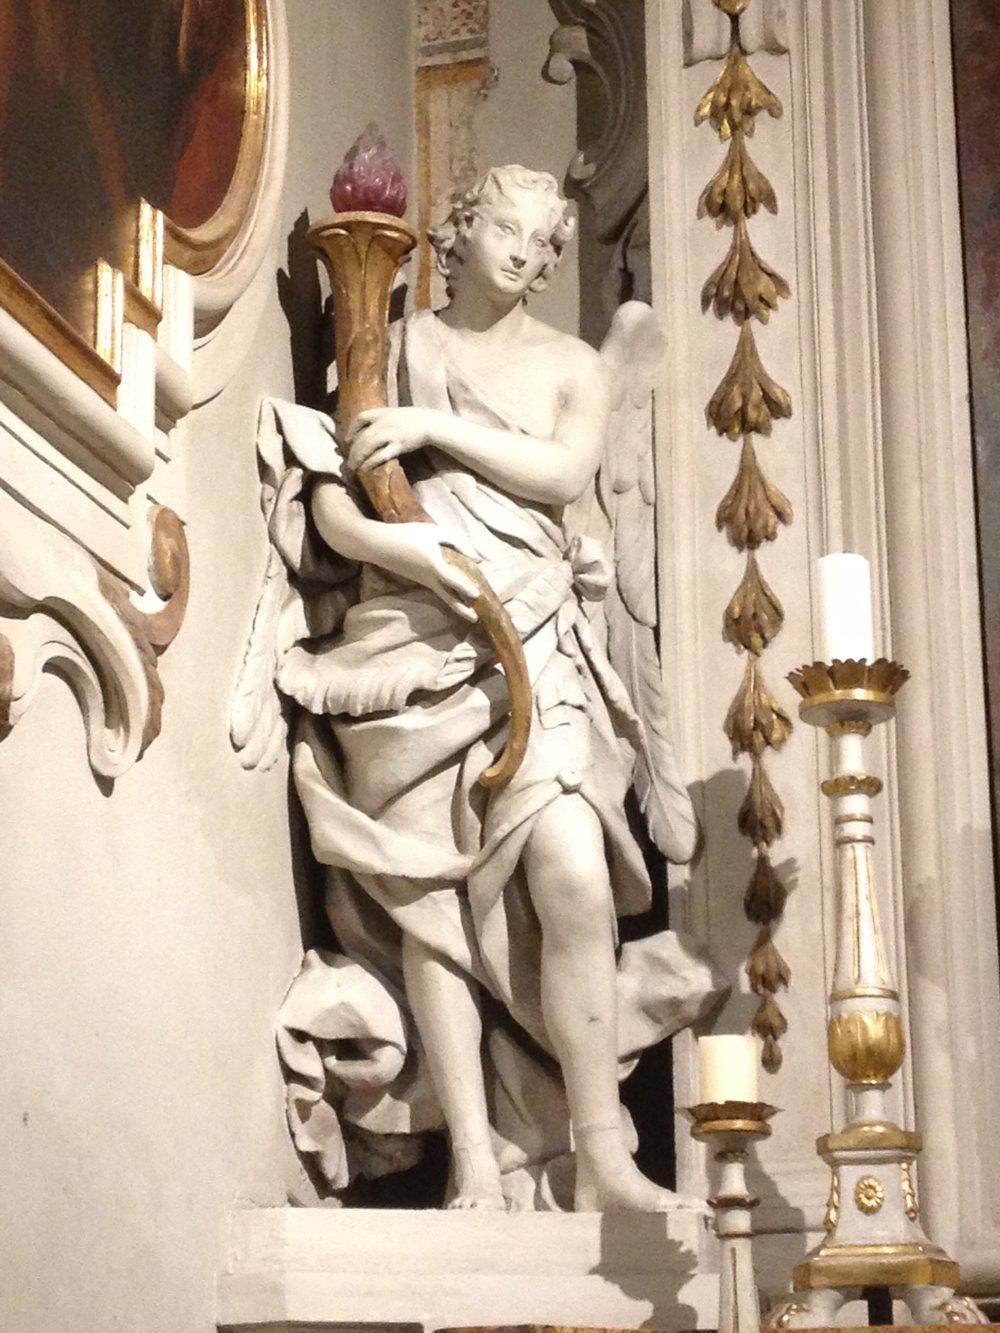 Pseudoithyphallic-iconography-statues-jessewaugh.com-11.jpg